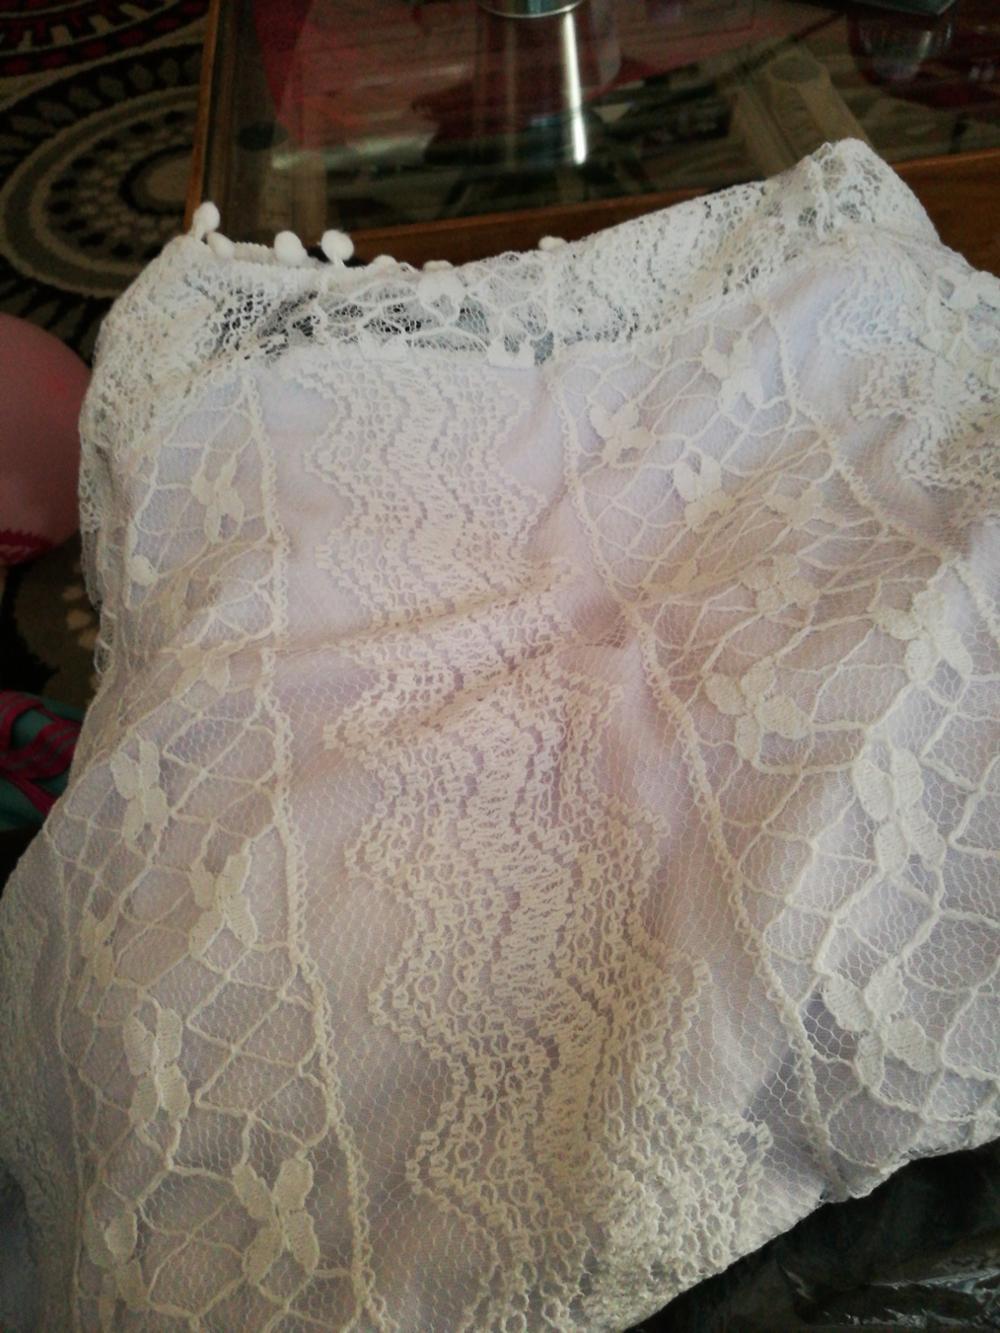 cd699c1a94ee 17 reviews for UZZDSS Summer Dress 2018 Women Casual Beach Short Dress  Tassel Black White Mini Lace Dress Sexy Party Dresses Vestidos S-XXL